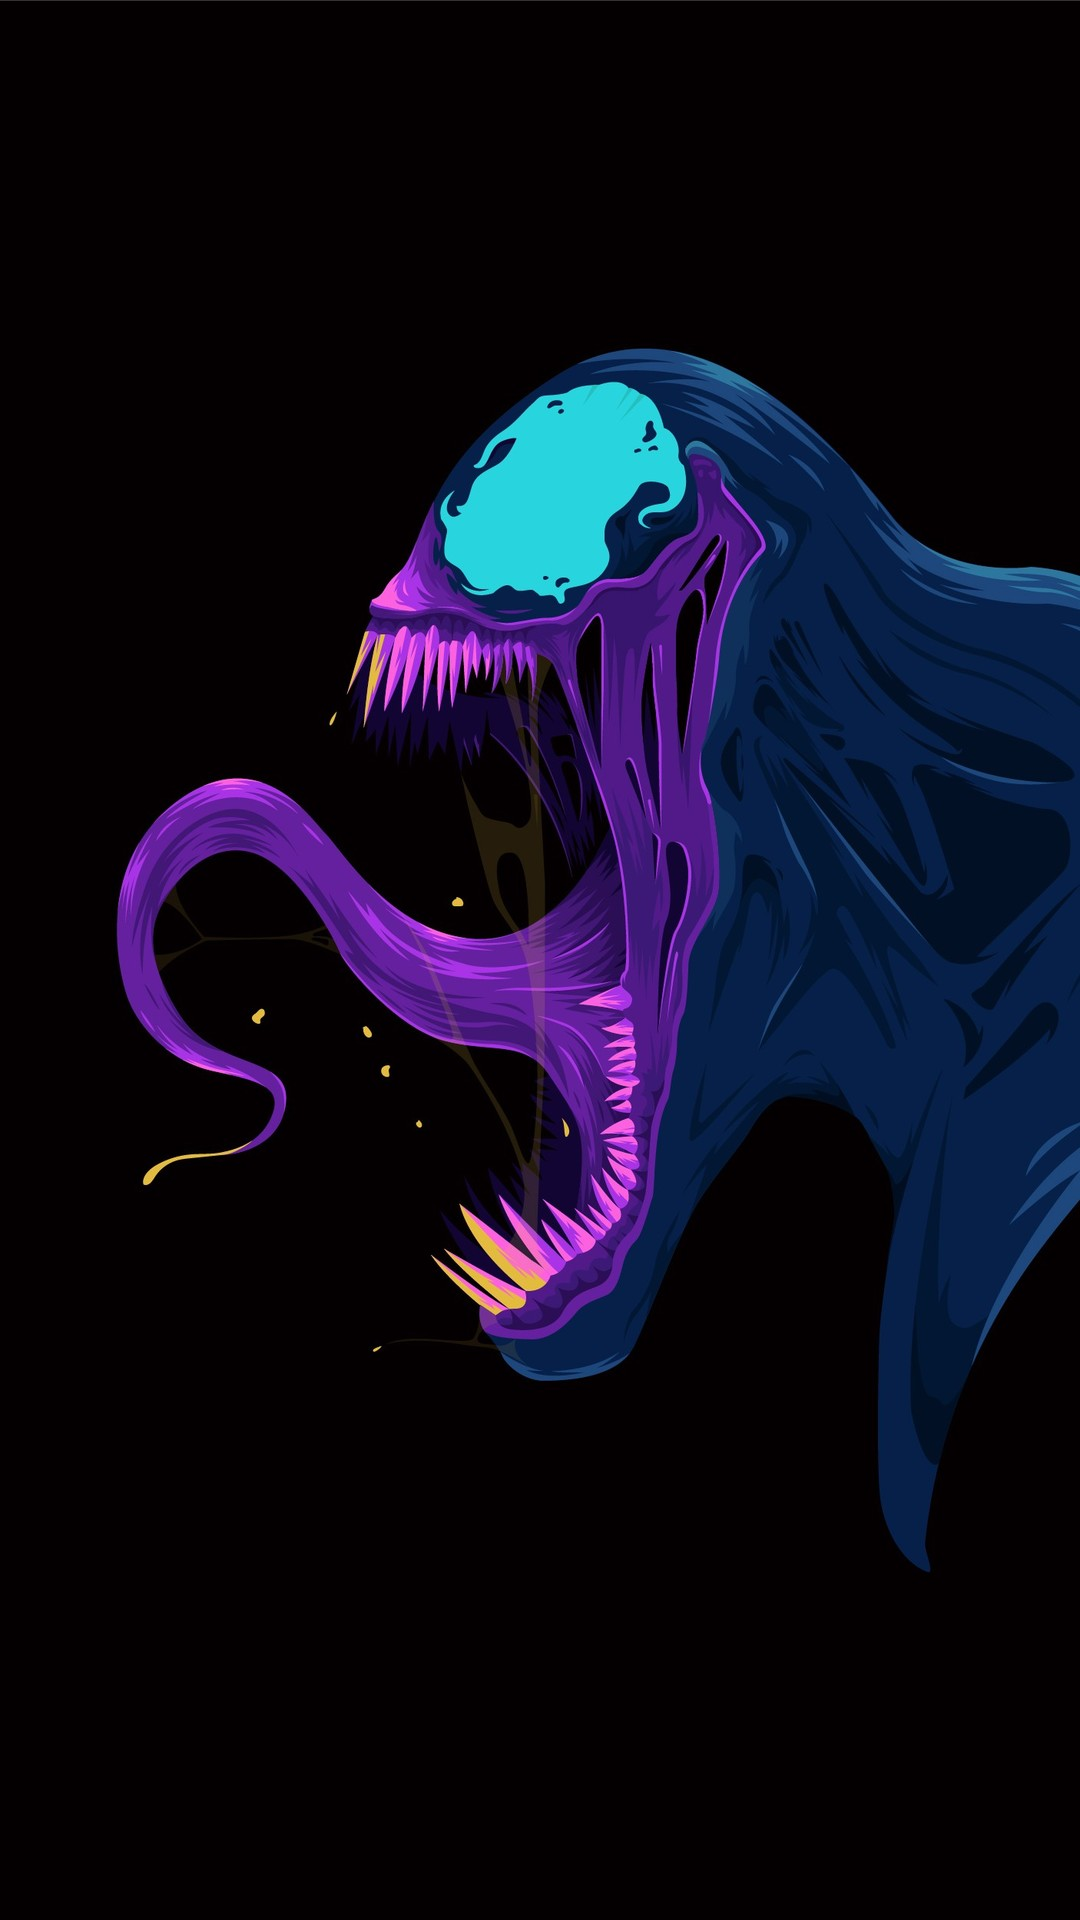 Amoled Venom iPhone Wallpaper